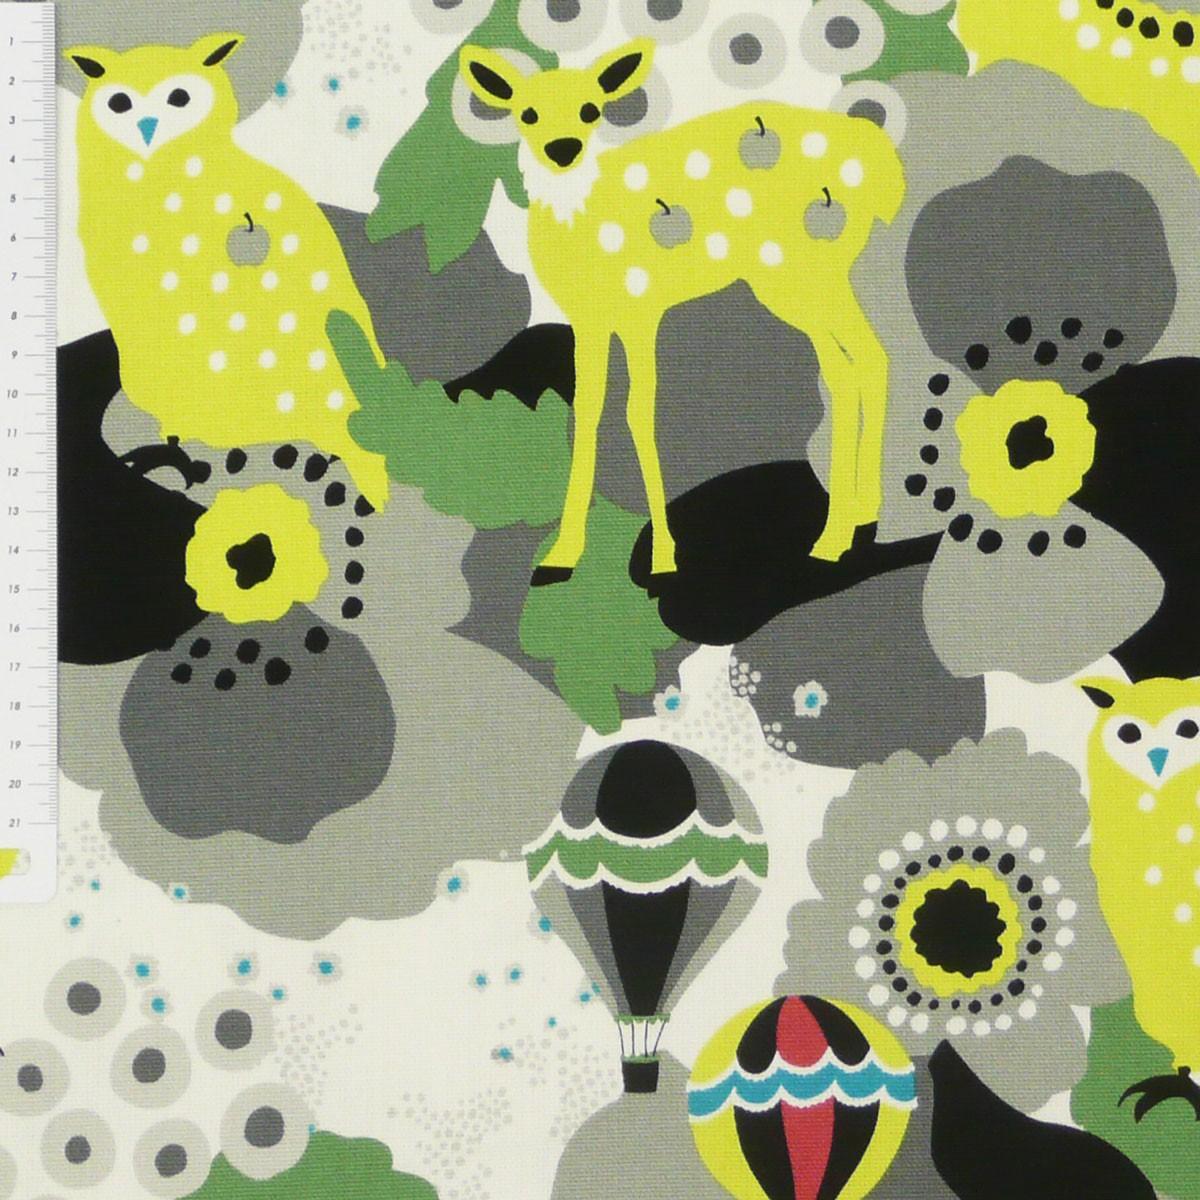 stoff canvas kayo horaguchi eule bambi grau gelb baumwollstoff 1 10m breite stoffe stoffe. Black Bedroom Furniture Sets. Home Design Ideas